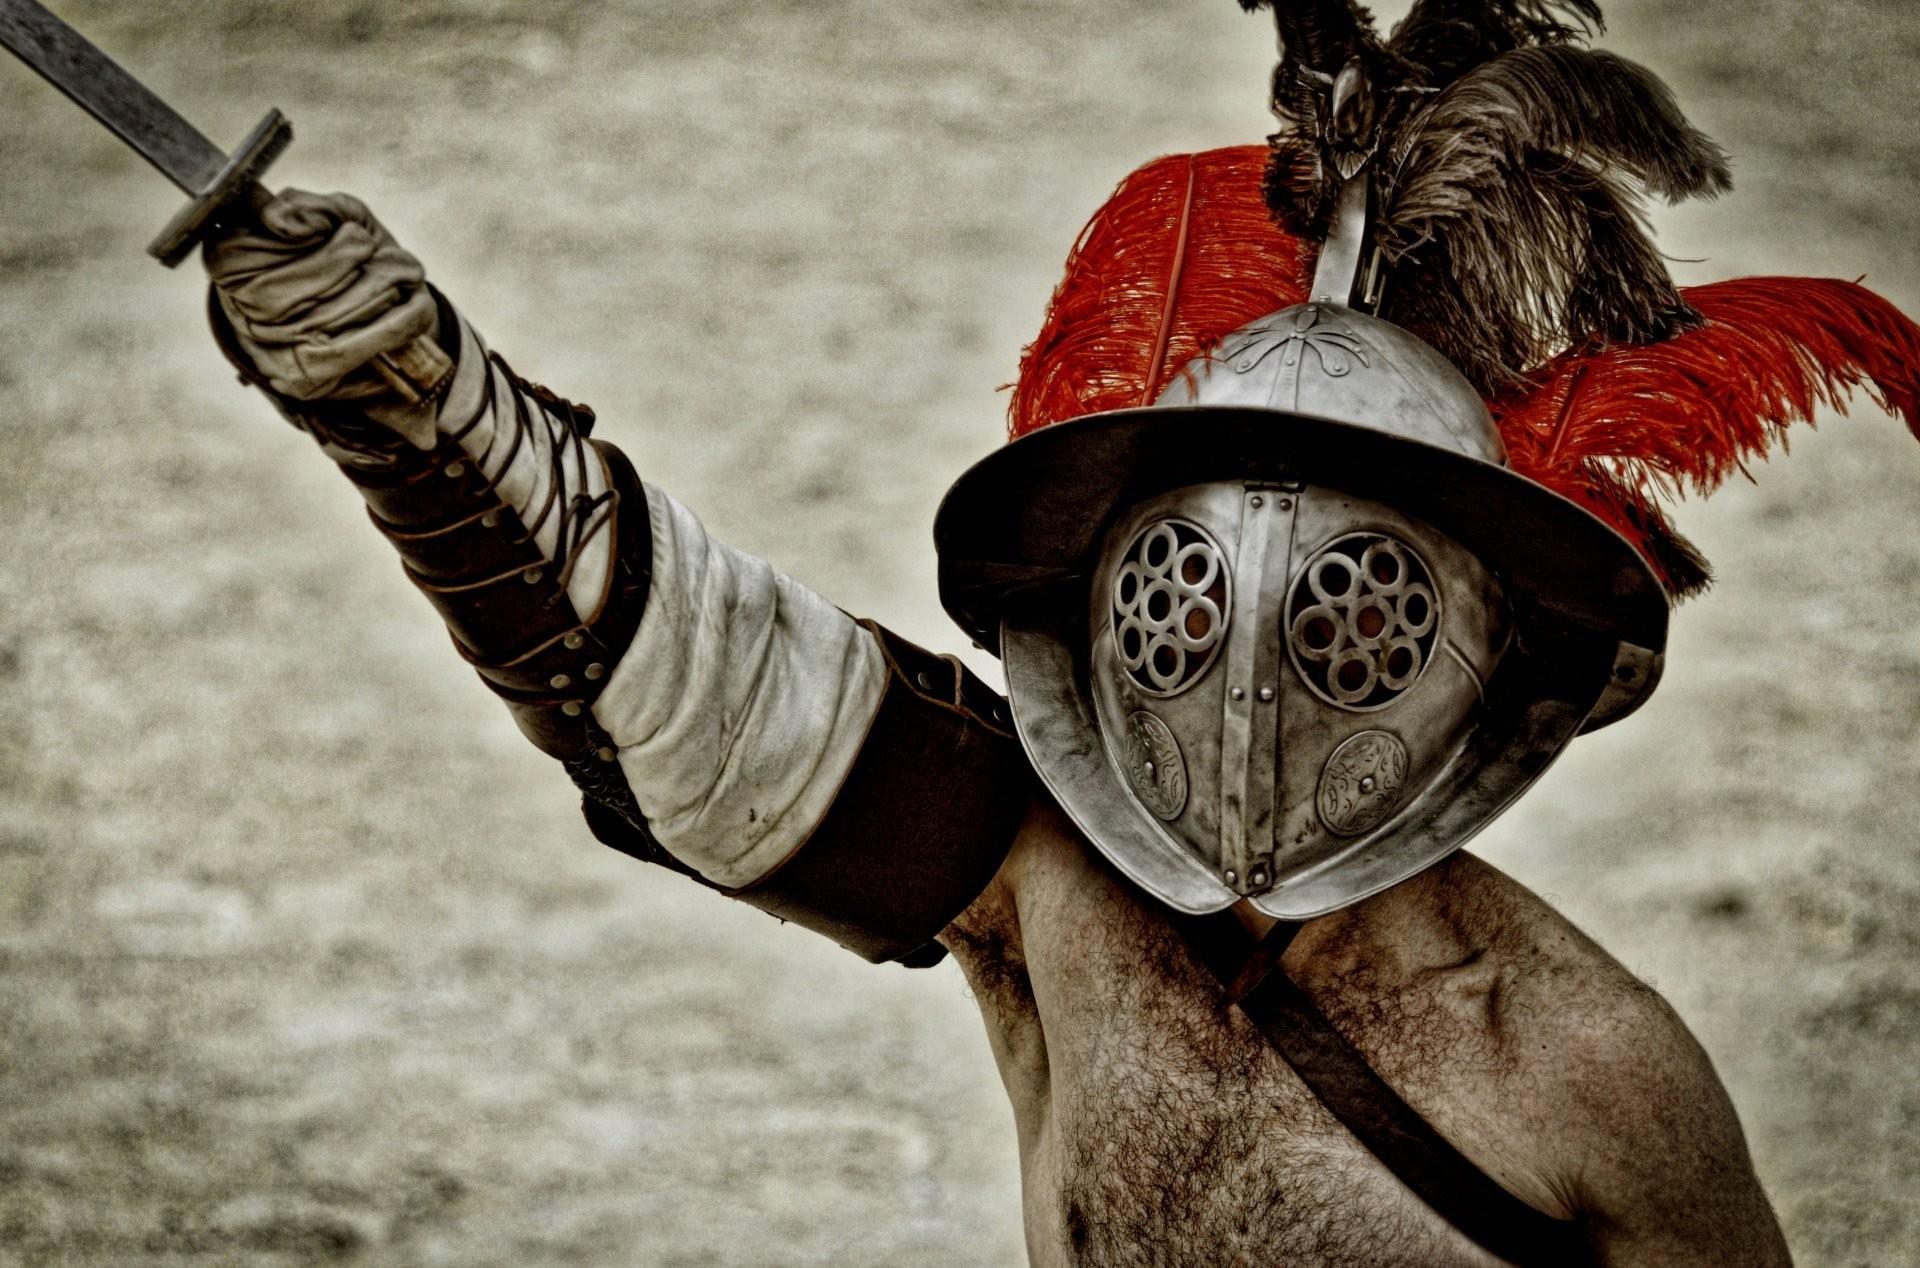 gladiator armour helmet sword greeting